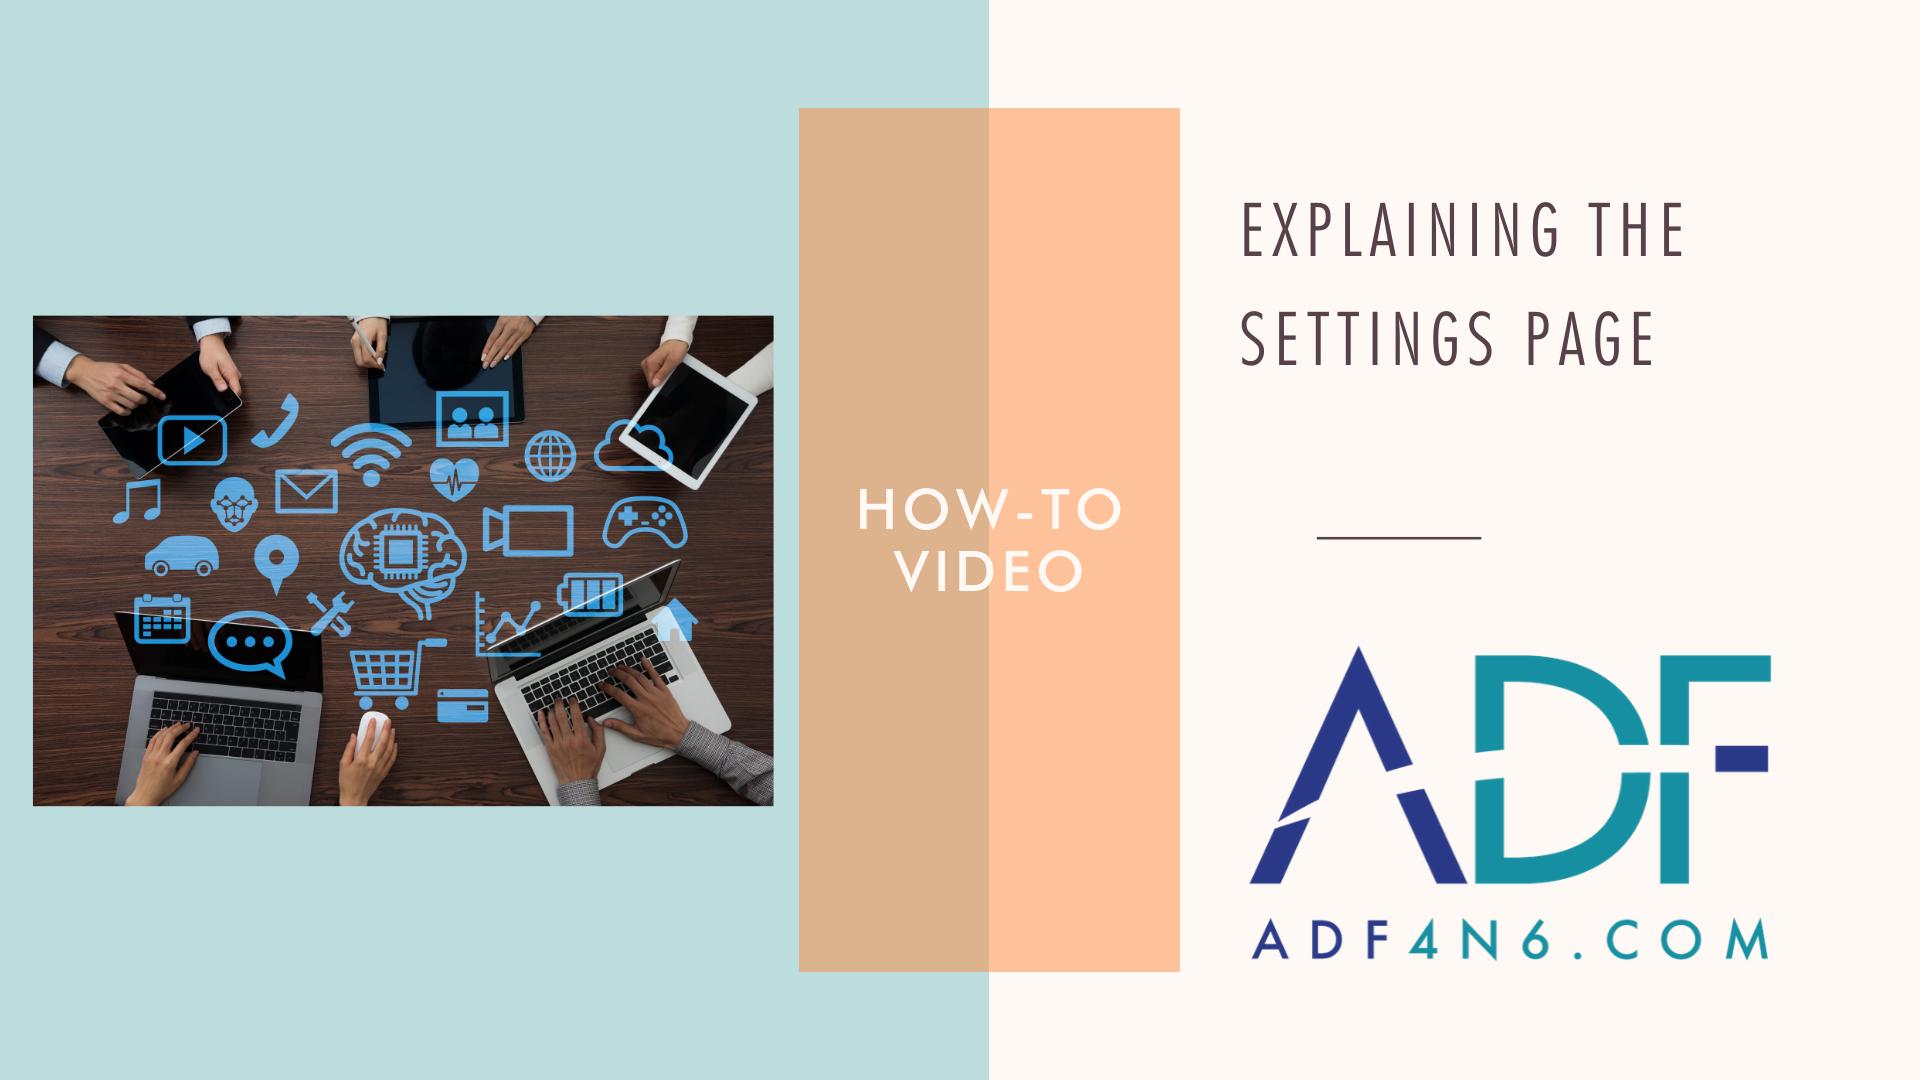 Explaining the Settings Page